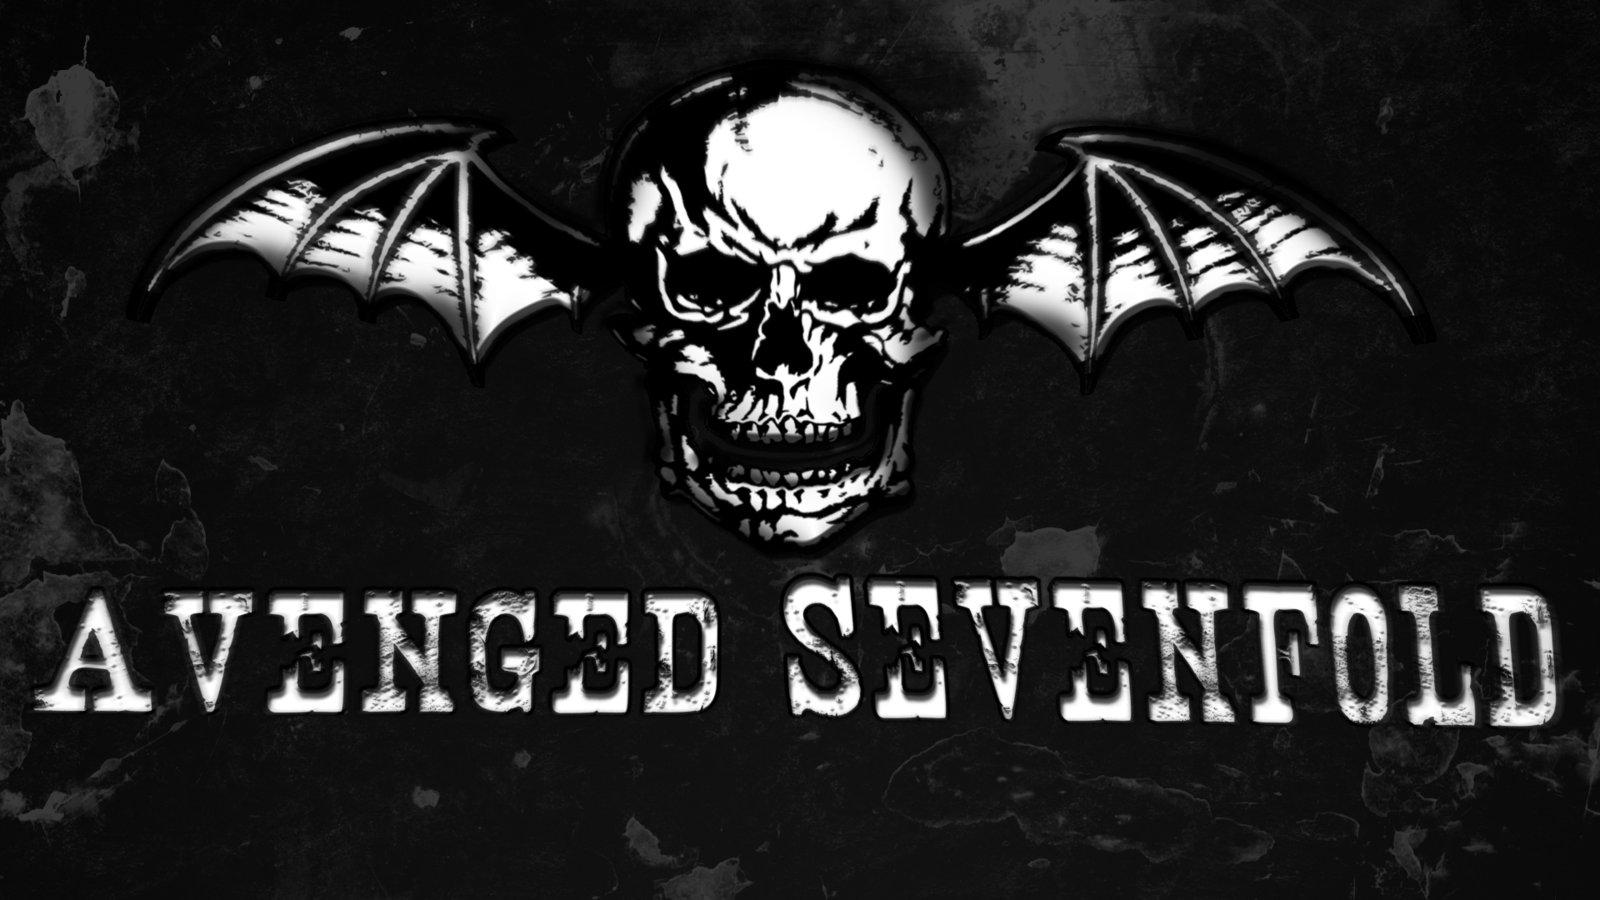 Avenged Sevenfold Deathbat Wallpaper by ChaoticHazard on Wallpaper 1600x900